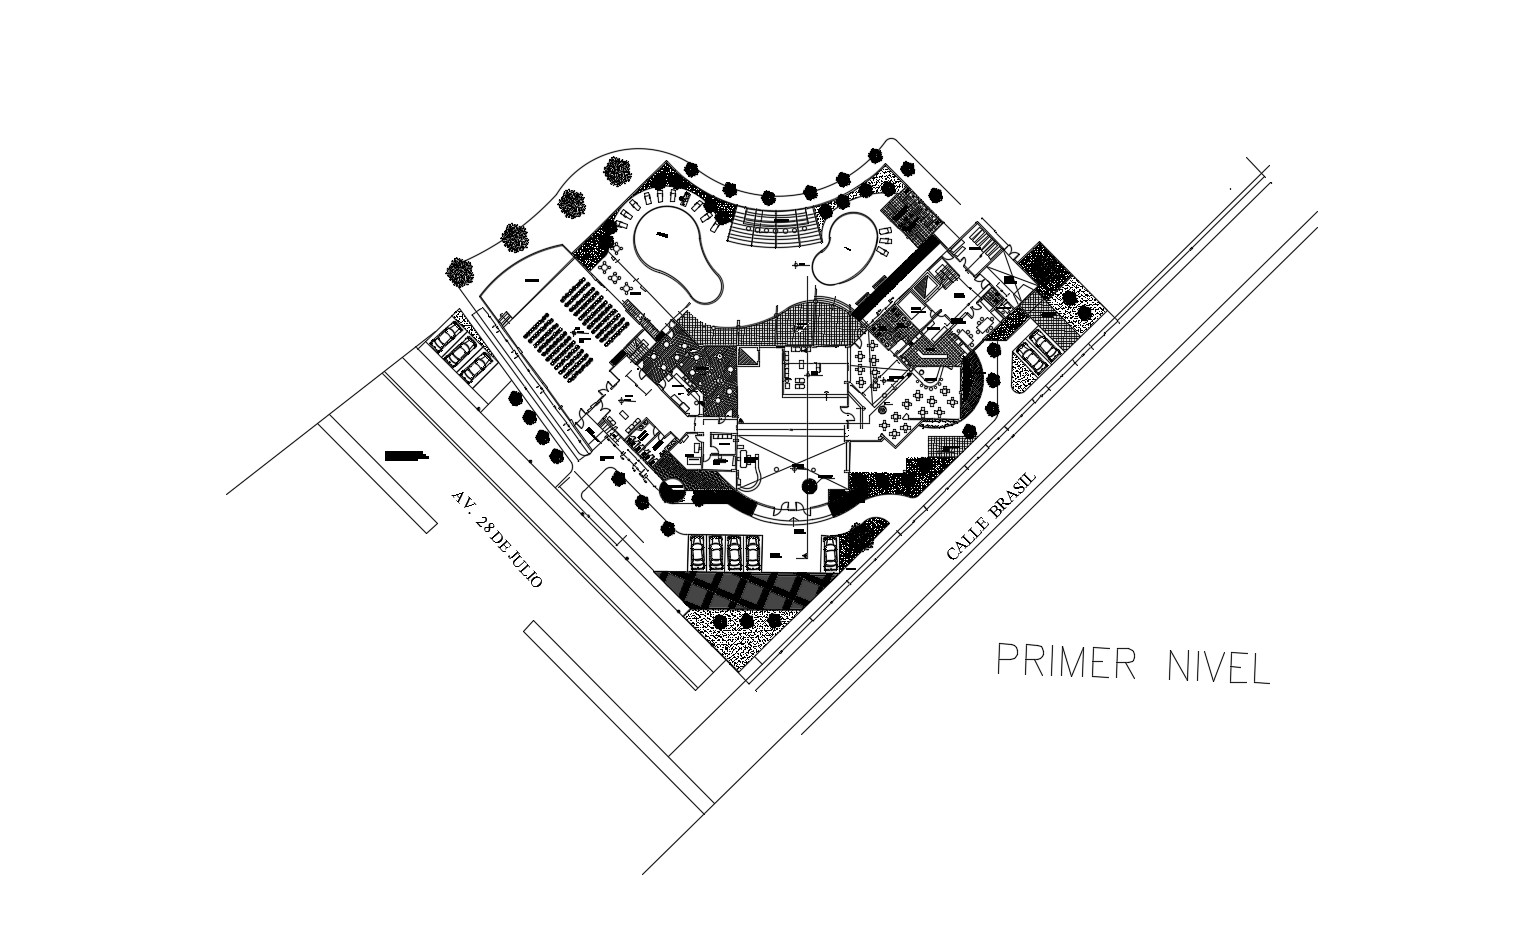 Restaurant  plan in AutoCAD file